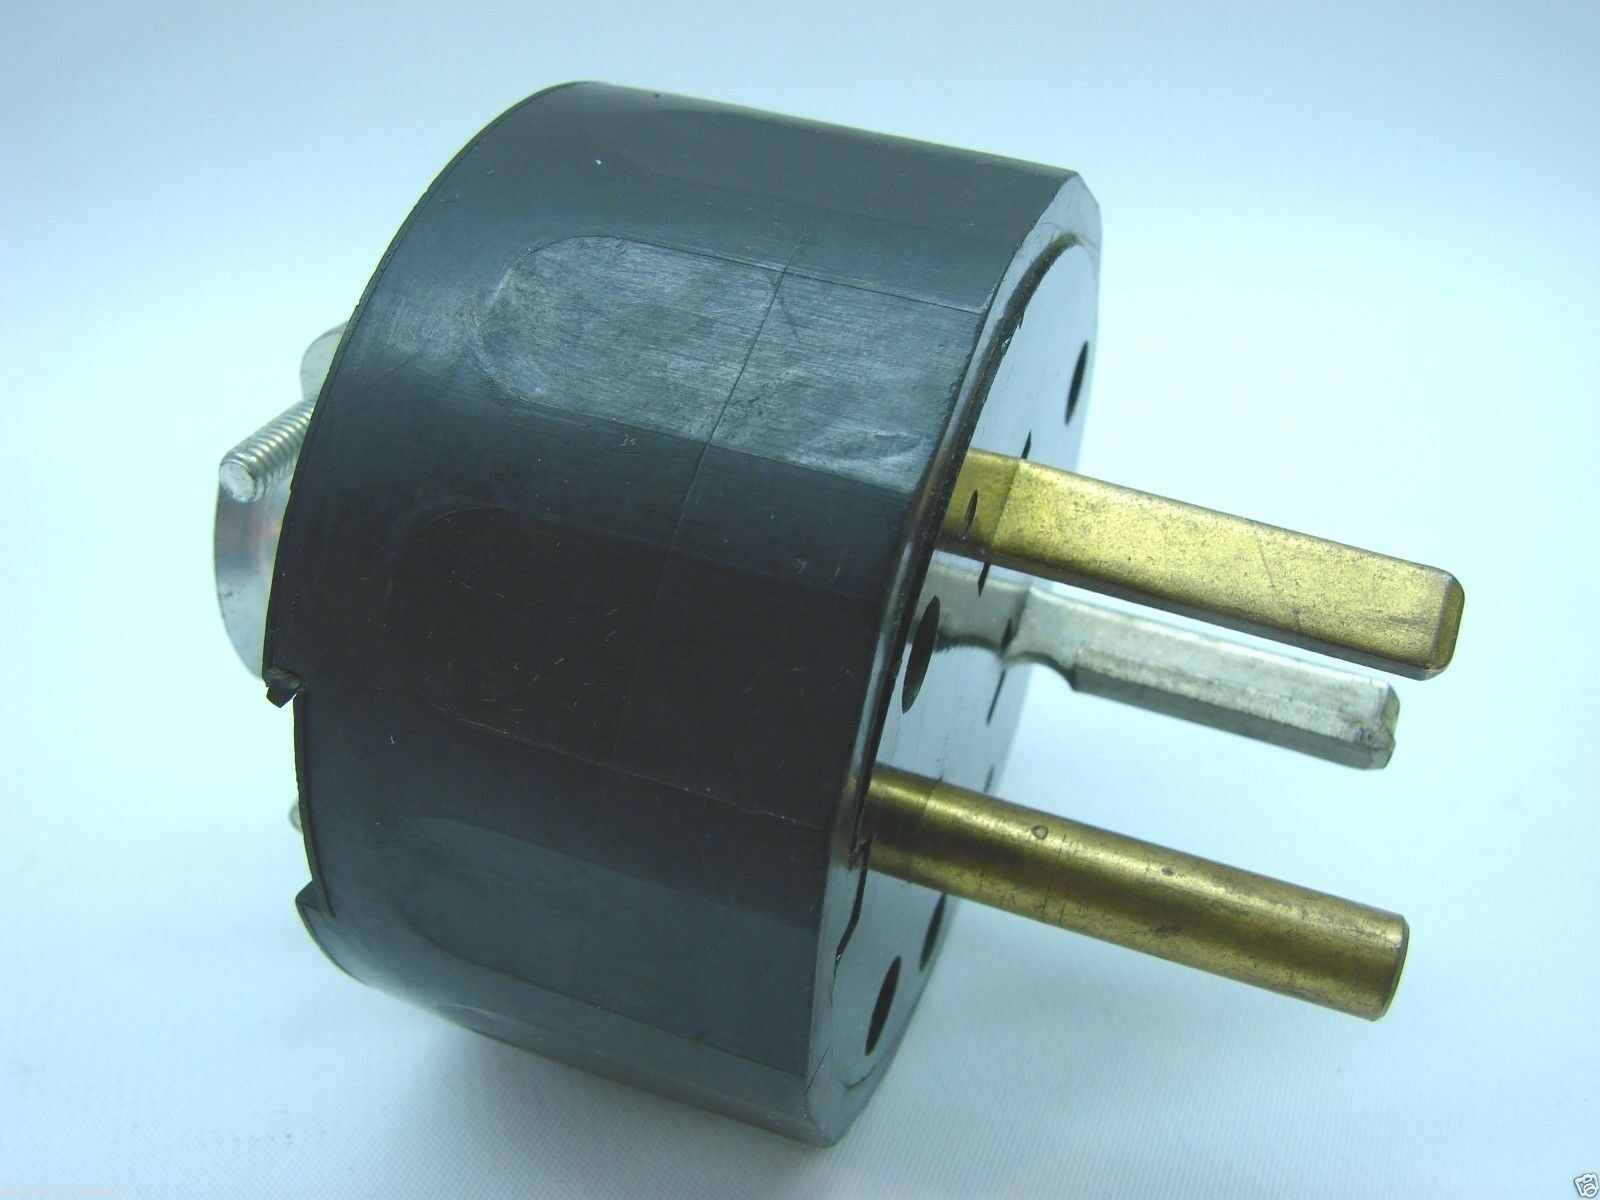 Hubbell Vintage 2 Pole 3 Wire 125 Volt 30 Amp AC Plug T8 | eBay